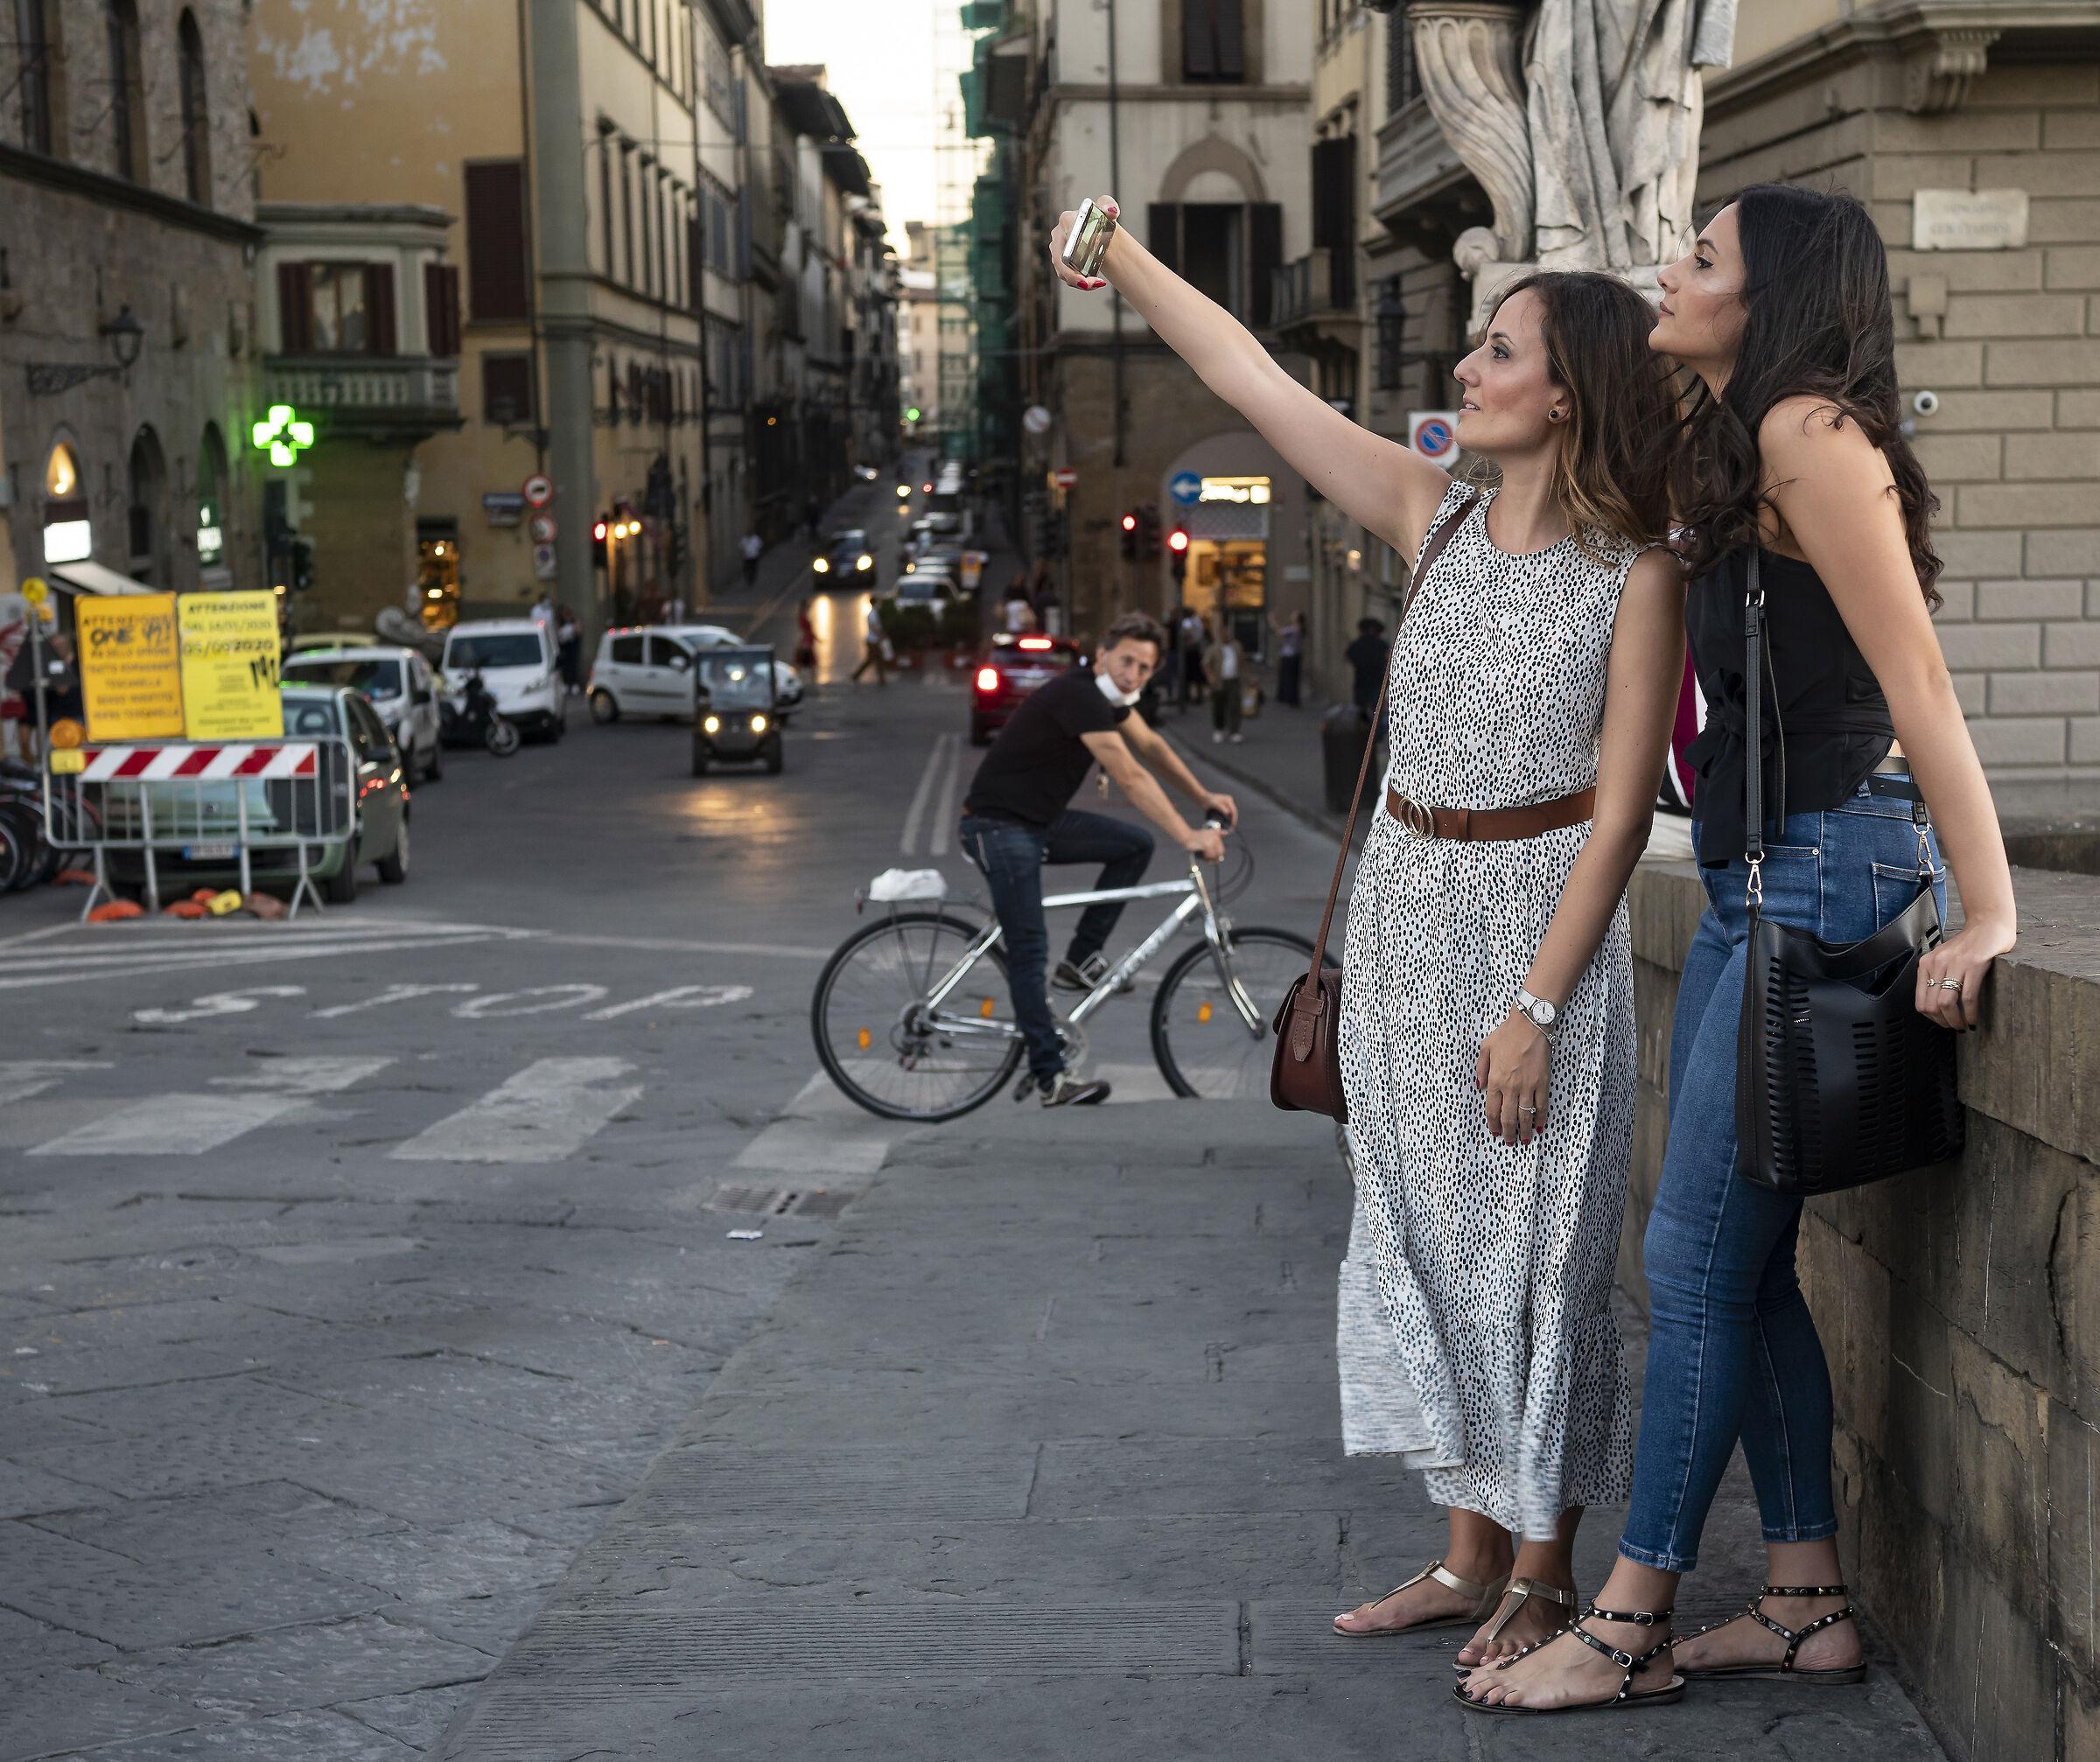 The selfie...